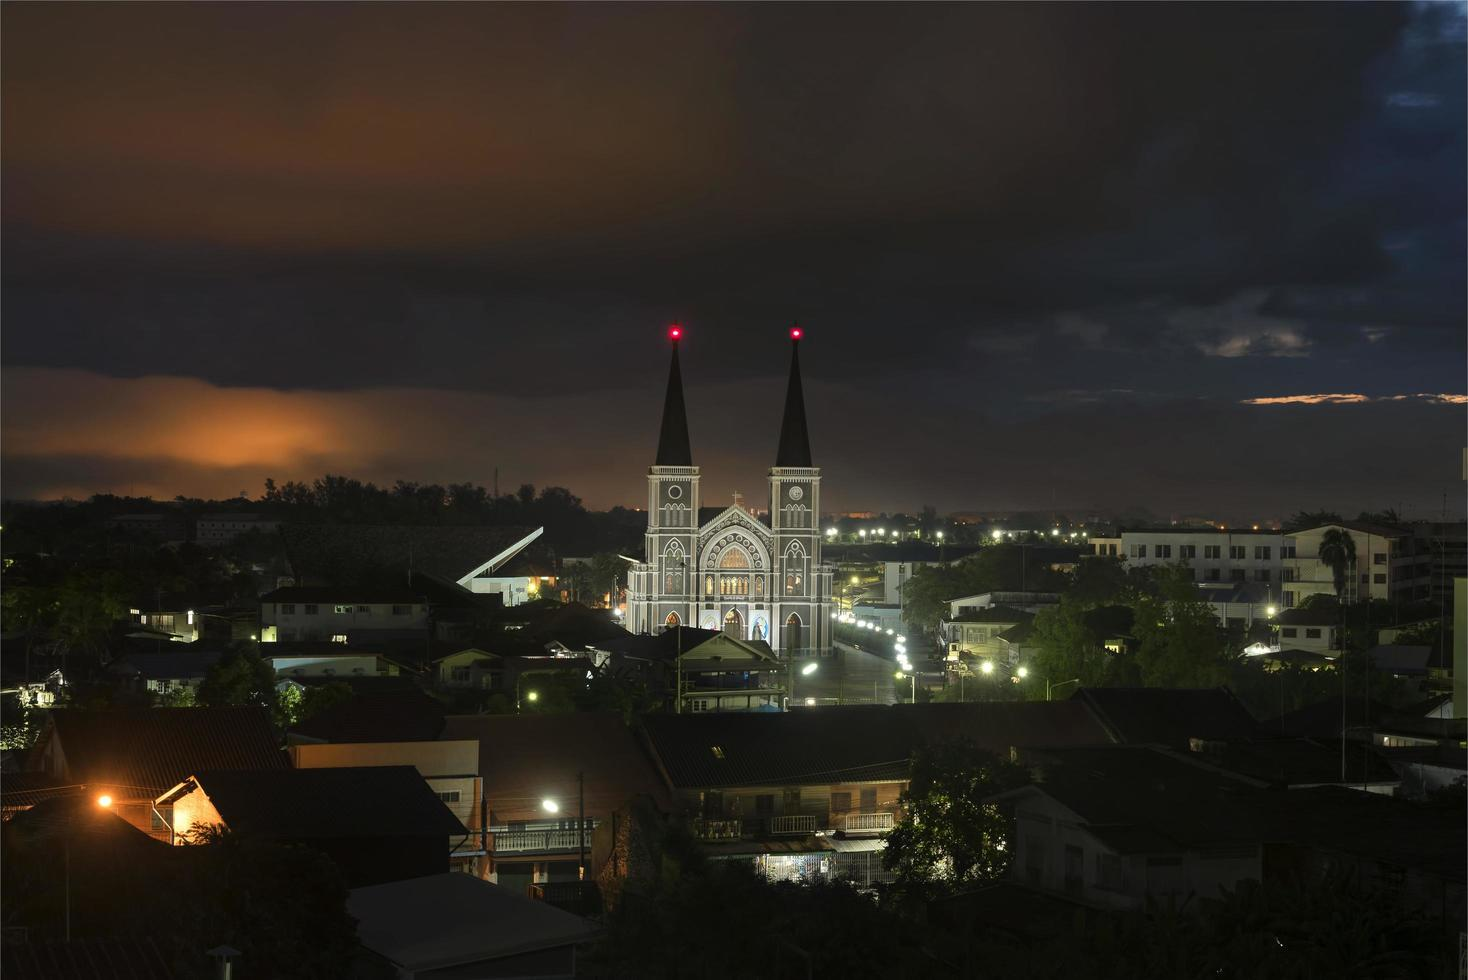 katholieke kerk 's nachts foto